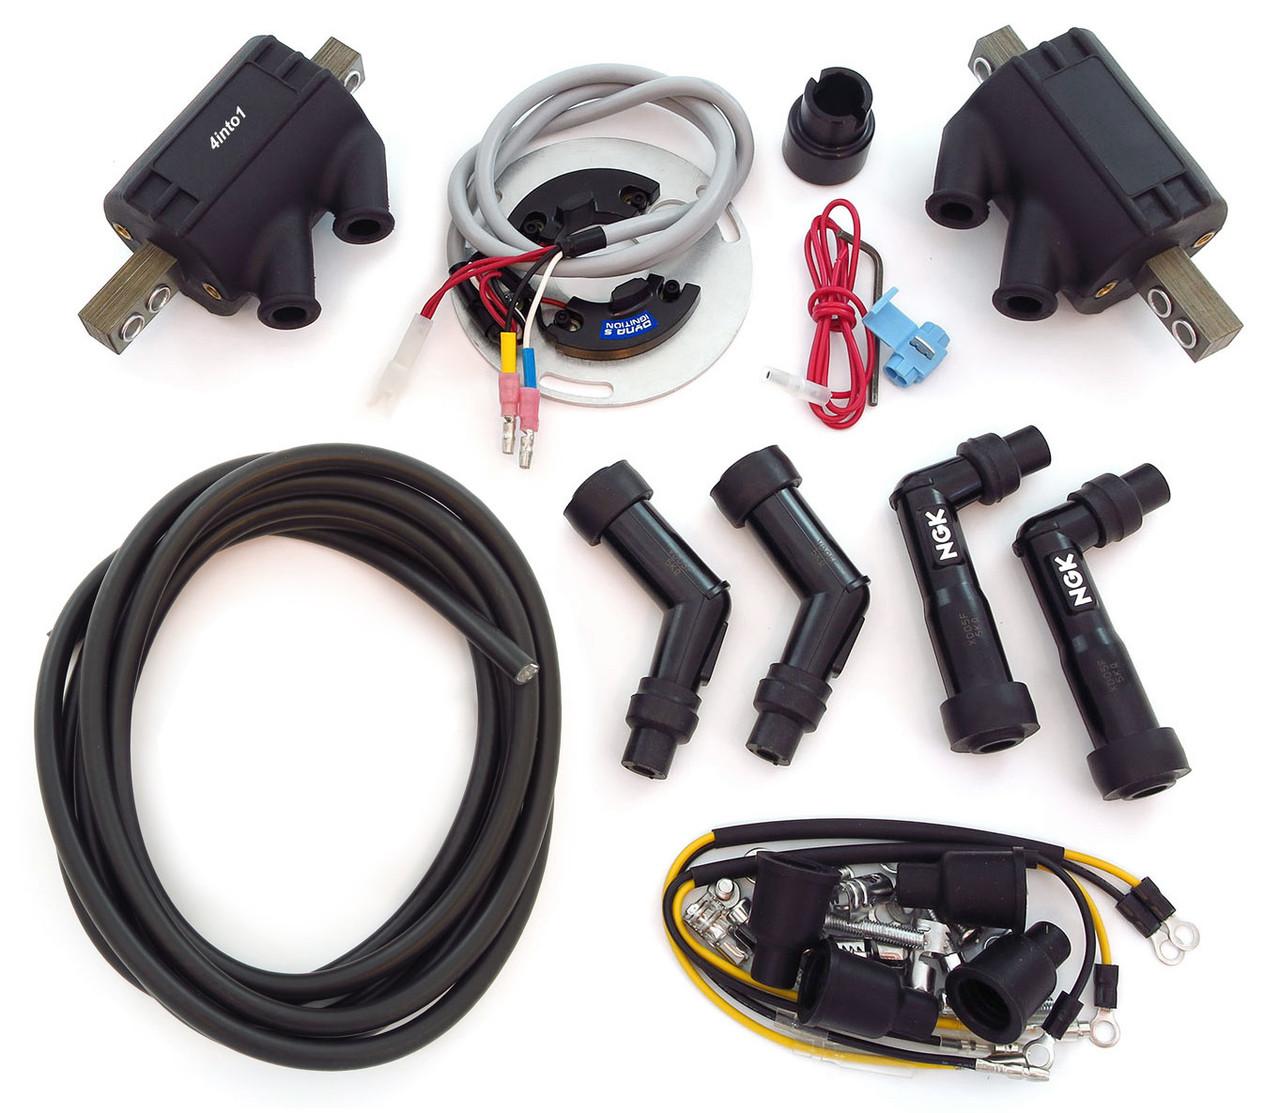 cb500 coil wiring wiring diagram repair guides cb500 coil wiring [ 1280 x 1113 Pixel ]